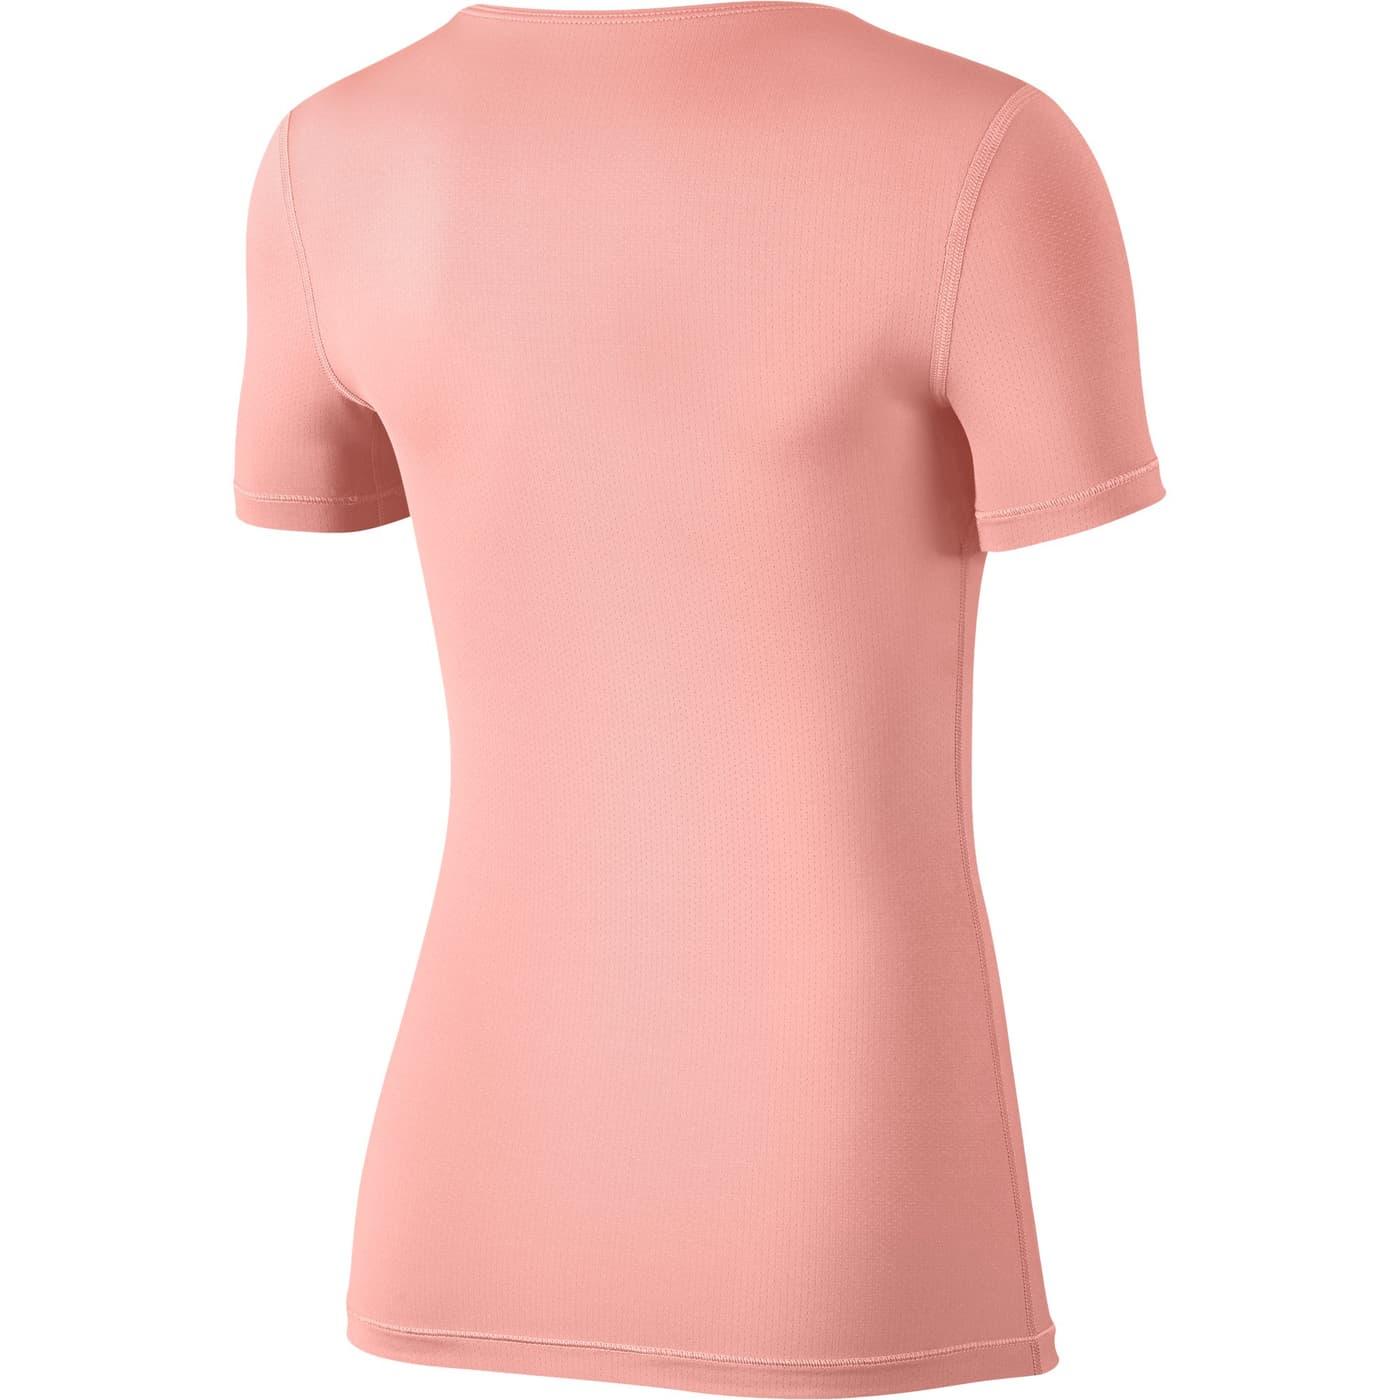 Damen Nike Pro T Top Shirt KJl1cF